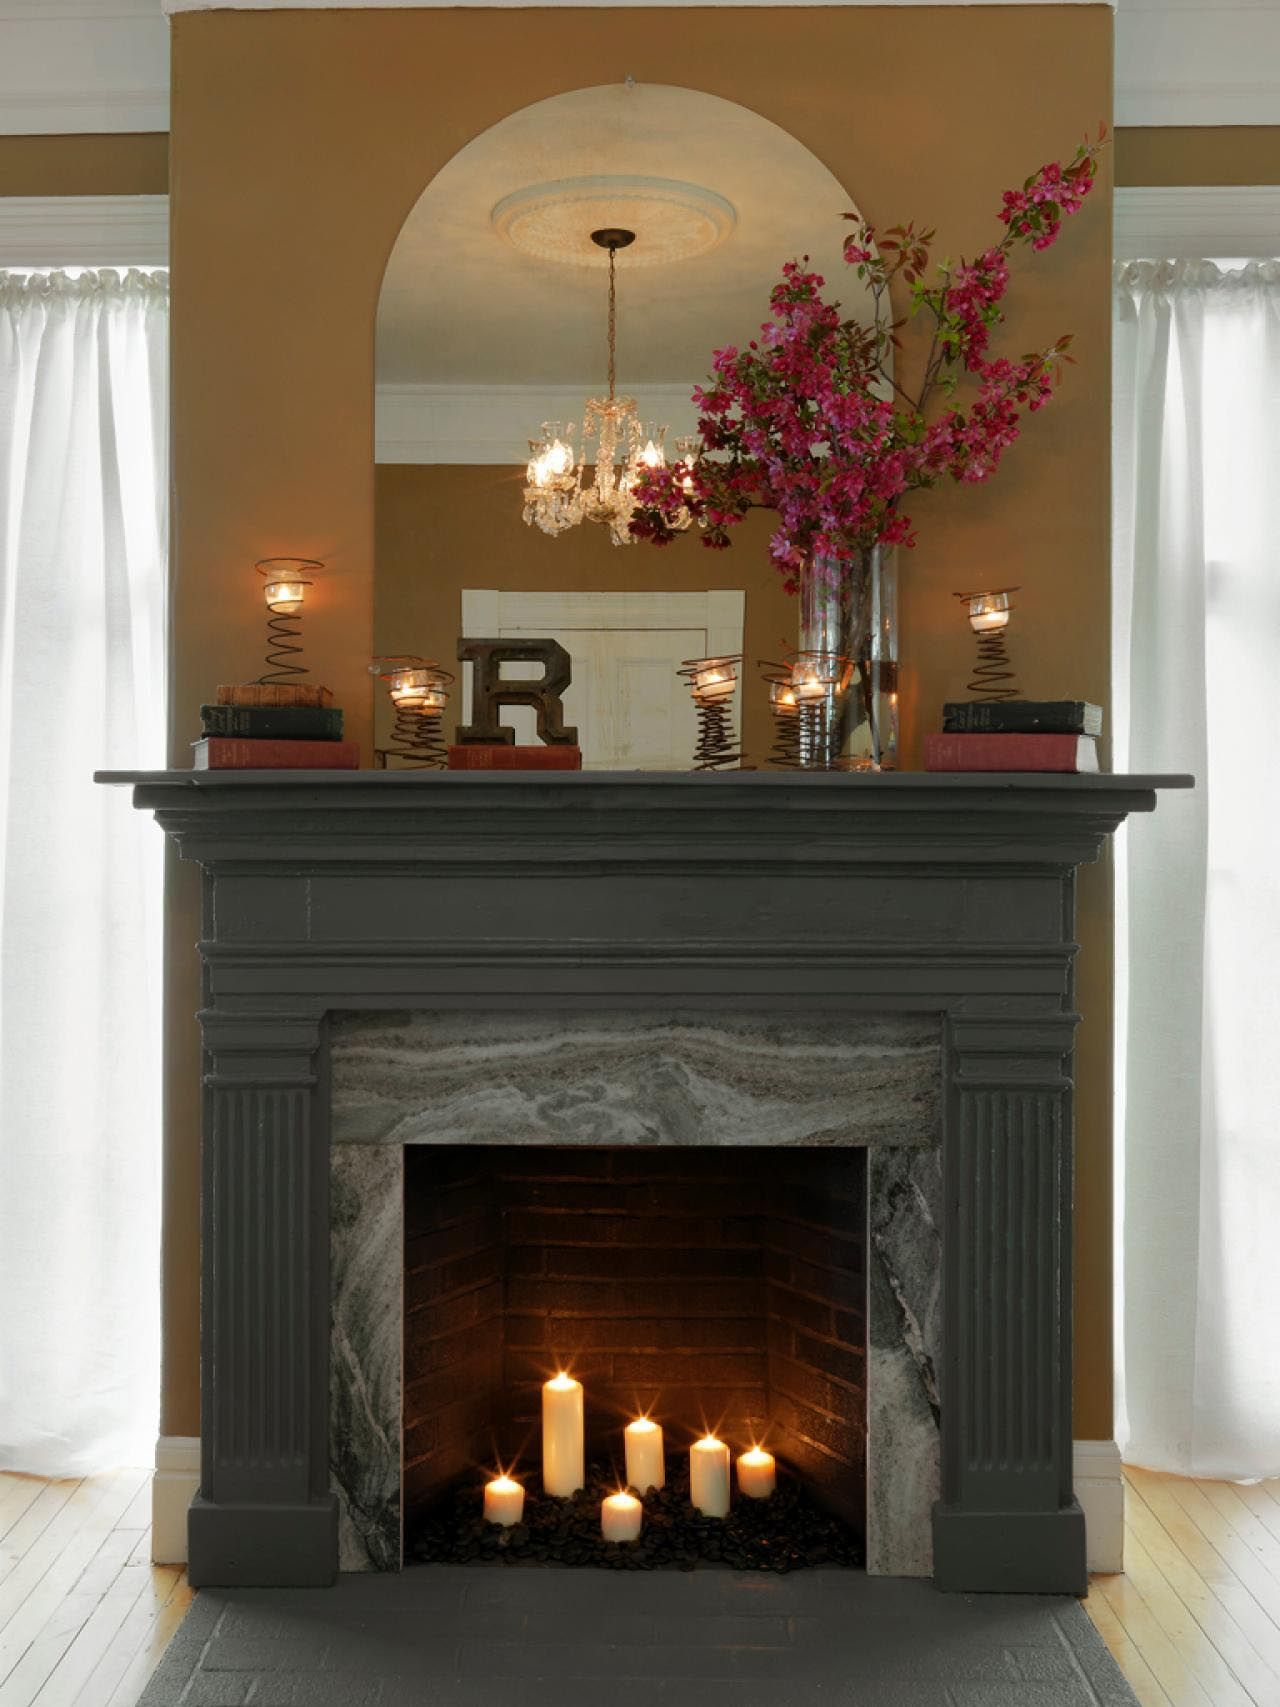 Homemade Fireplace Mantel Ideas